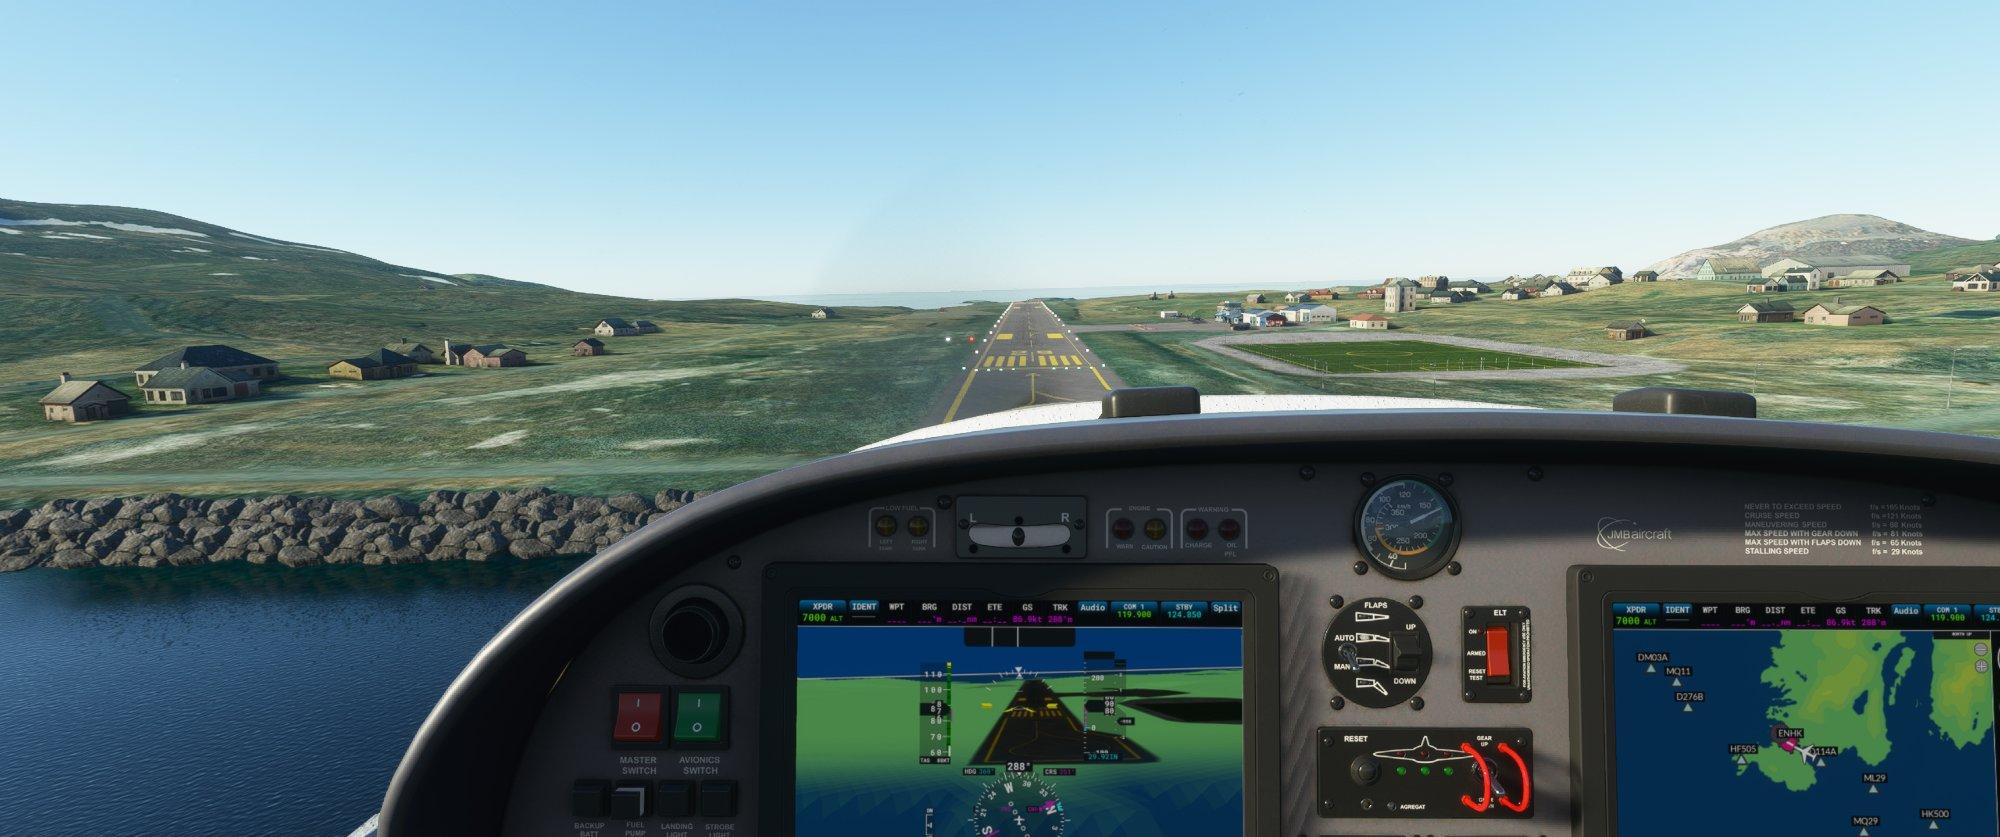 Microsoft Flight Simulator Screenshot 2020.11.20 - 12.58.57.29.jpg